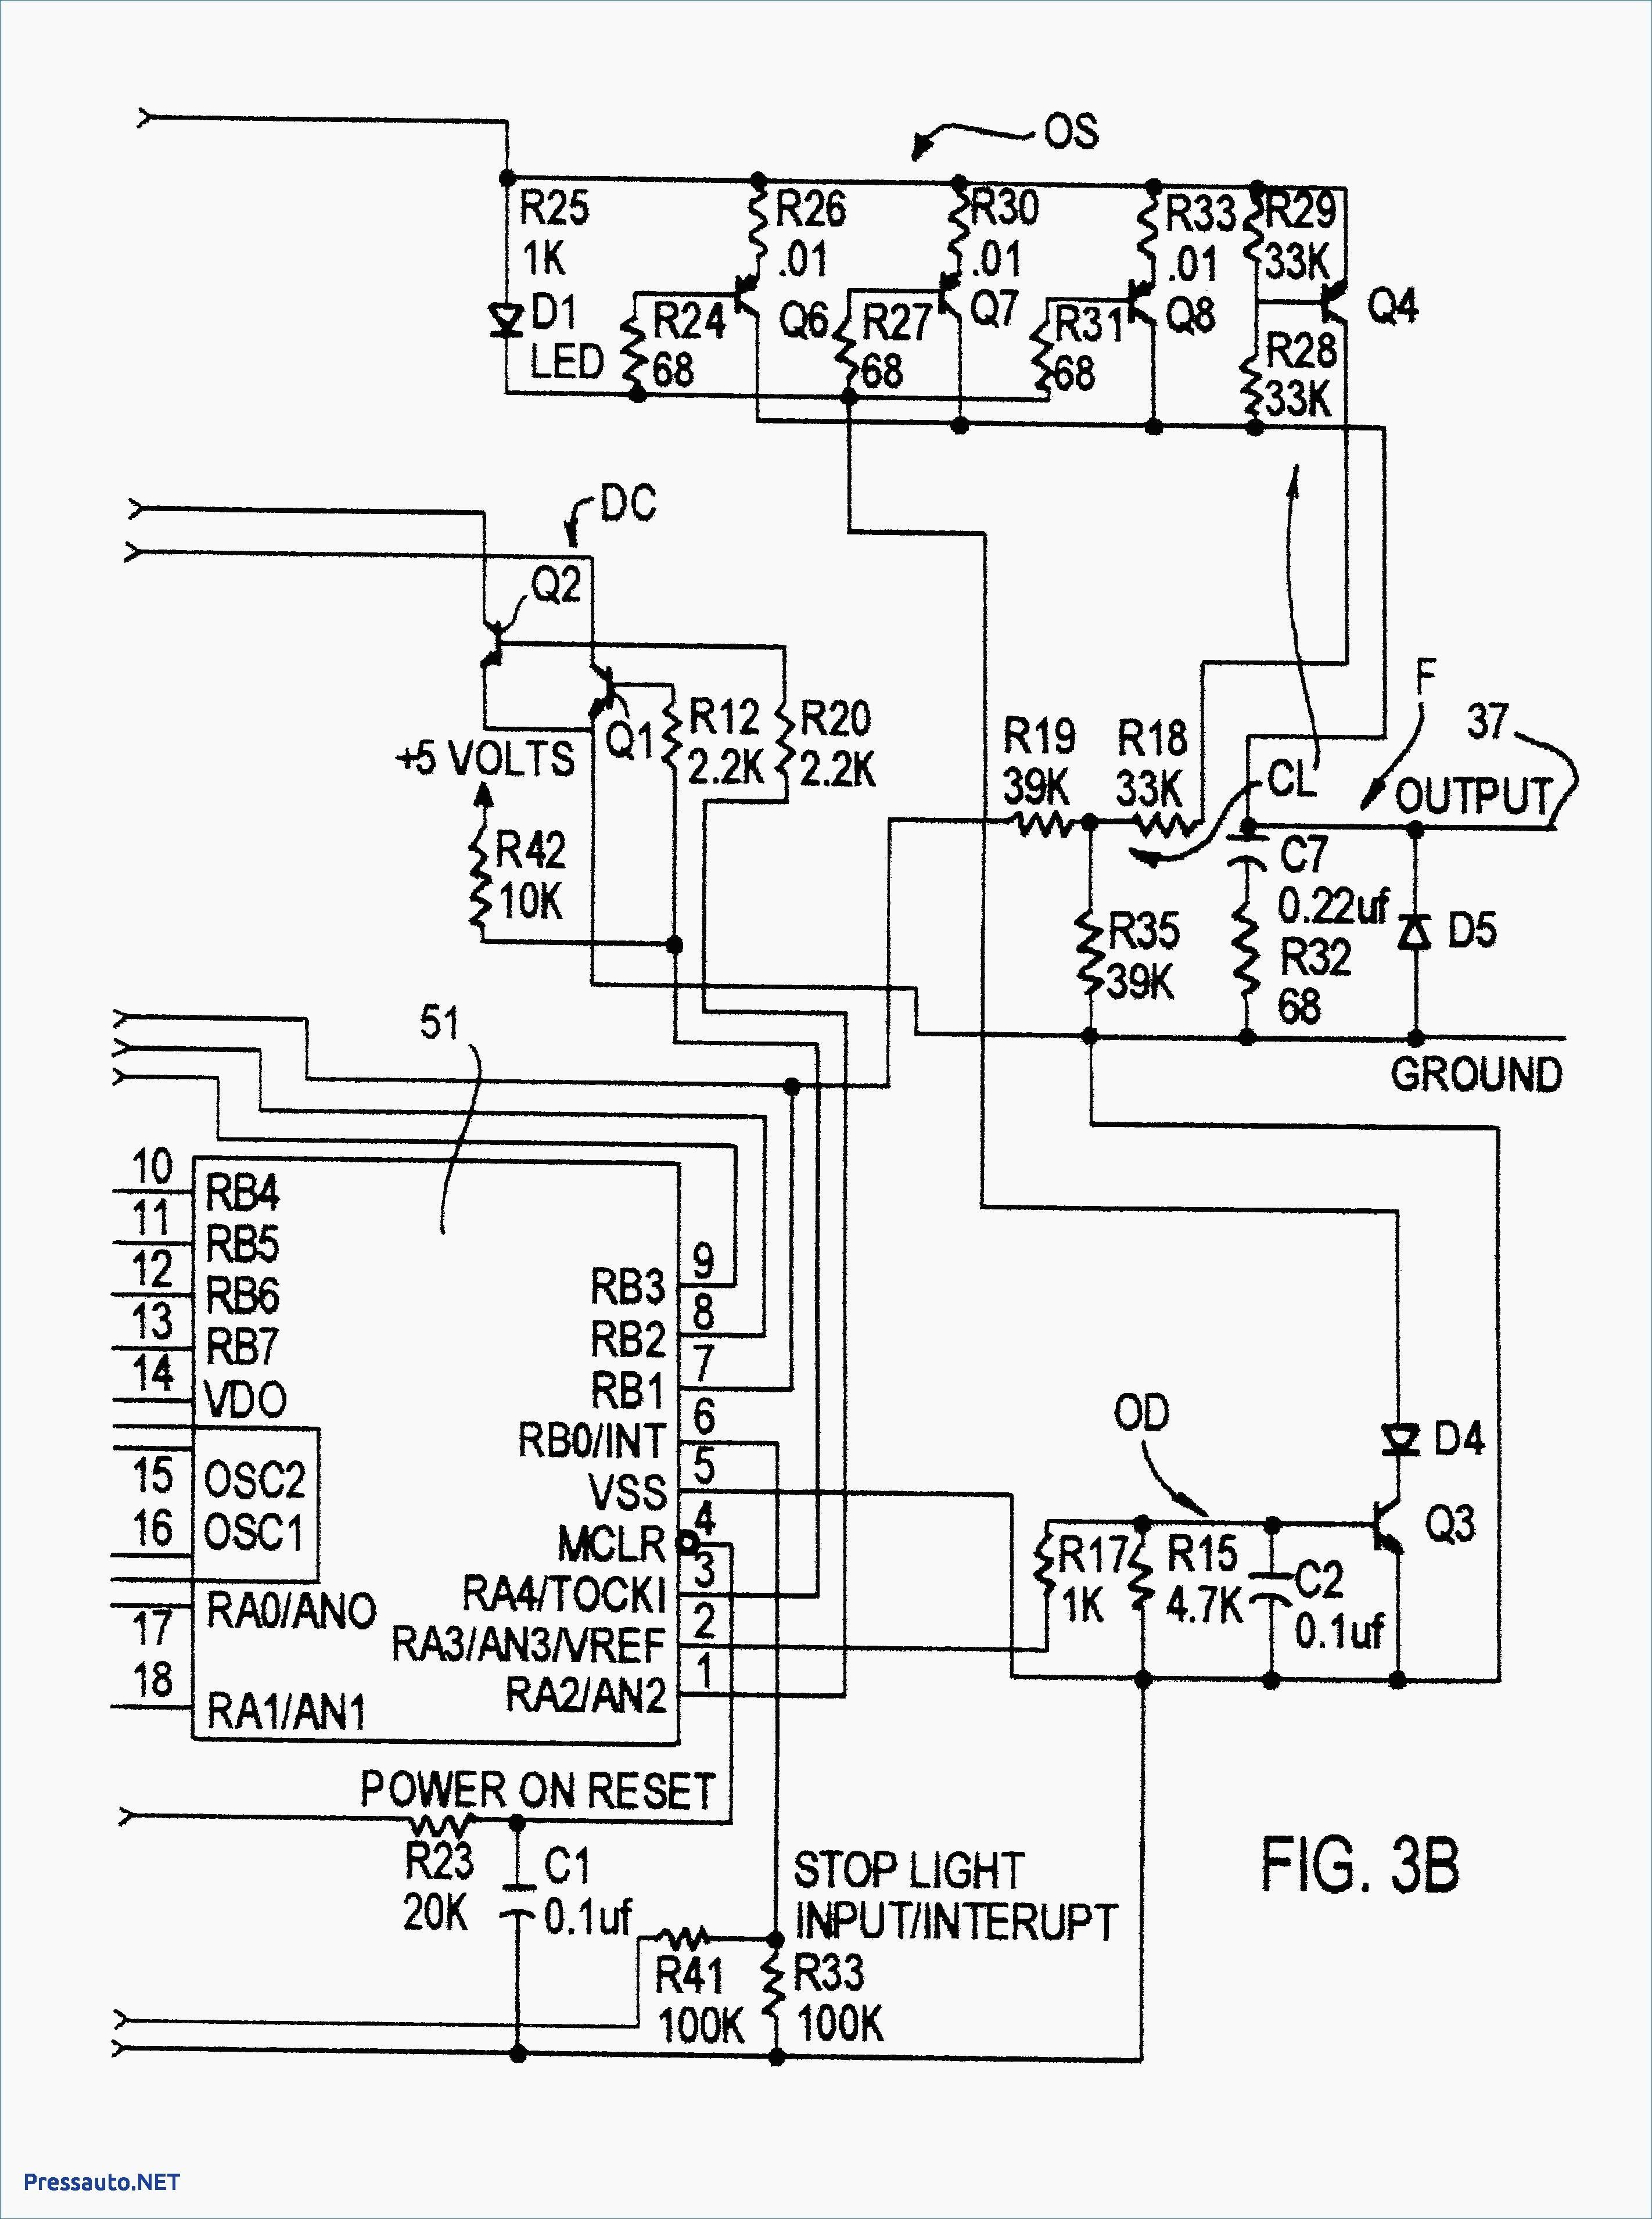 Electric Trailer Brakes Wiring Diagram Electric Circuit Diagram Inspirational Wiring Diagram Electric Of Electric Trailer Brakes Wiring Diagram